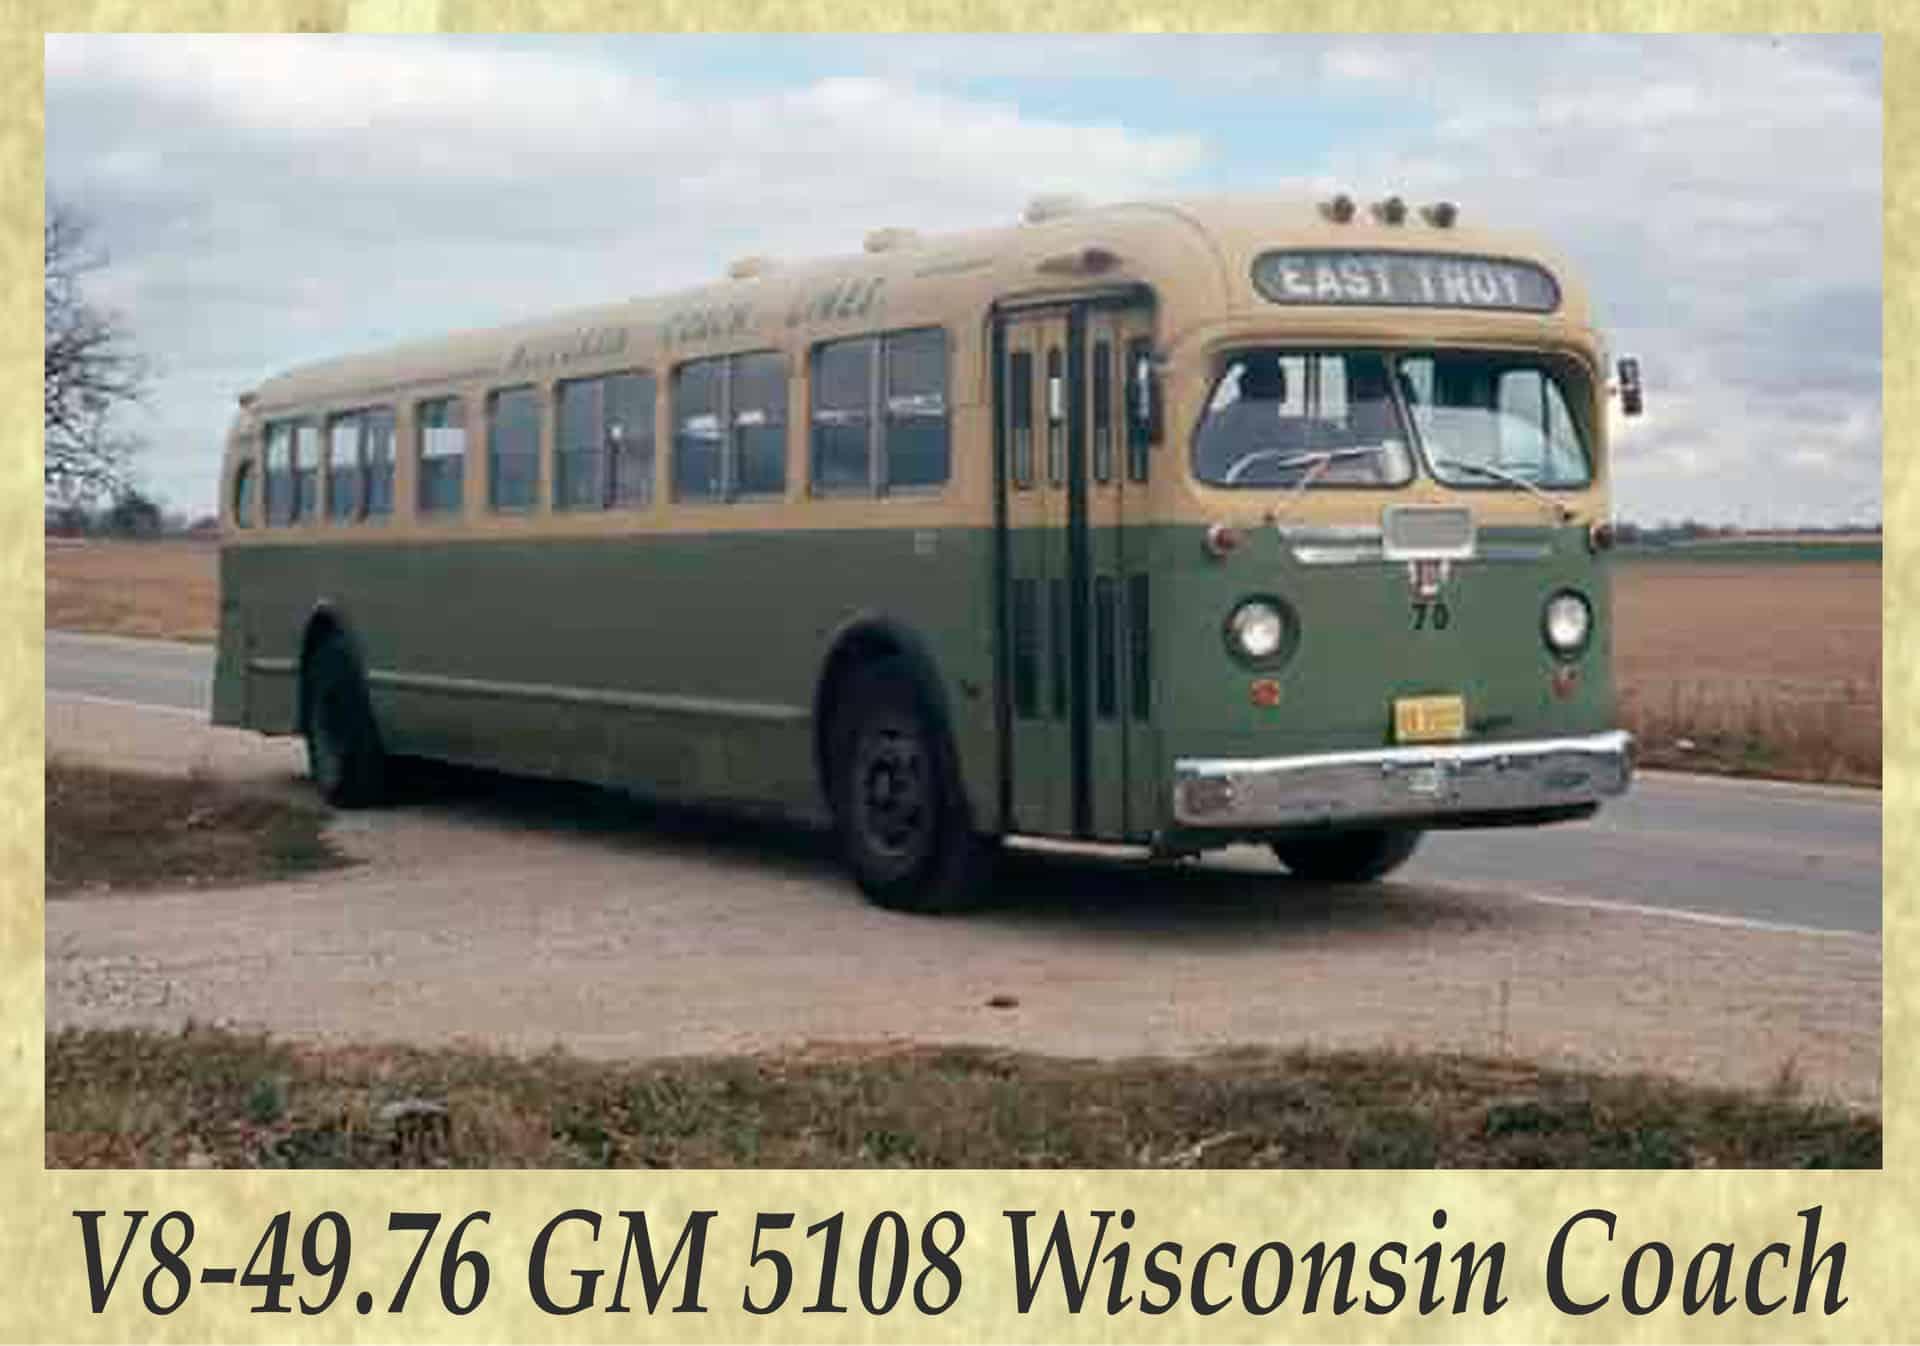 V8-49.76 GM 5108 Wisconsin Coach